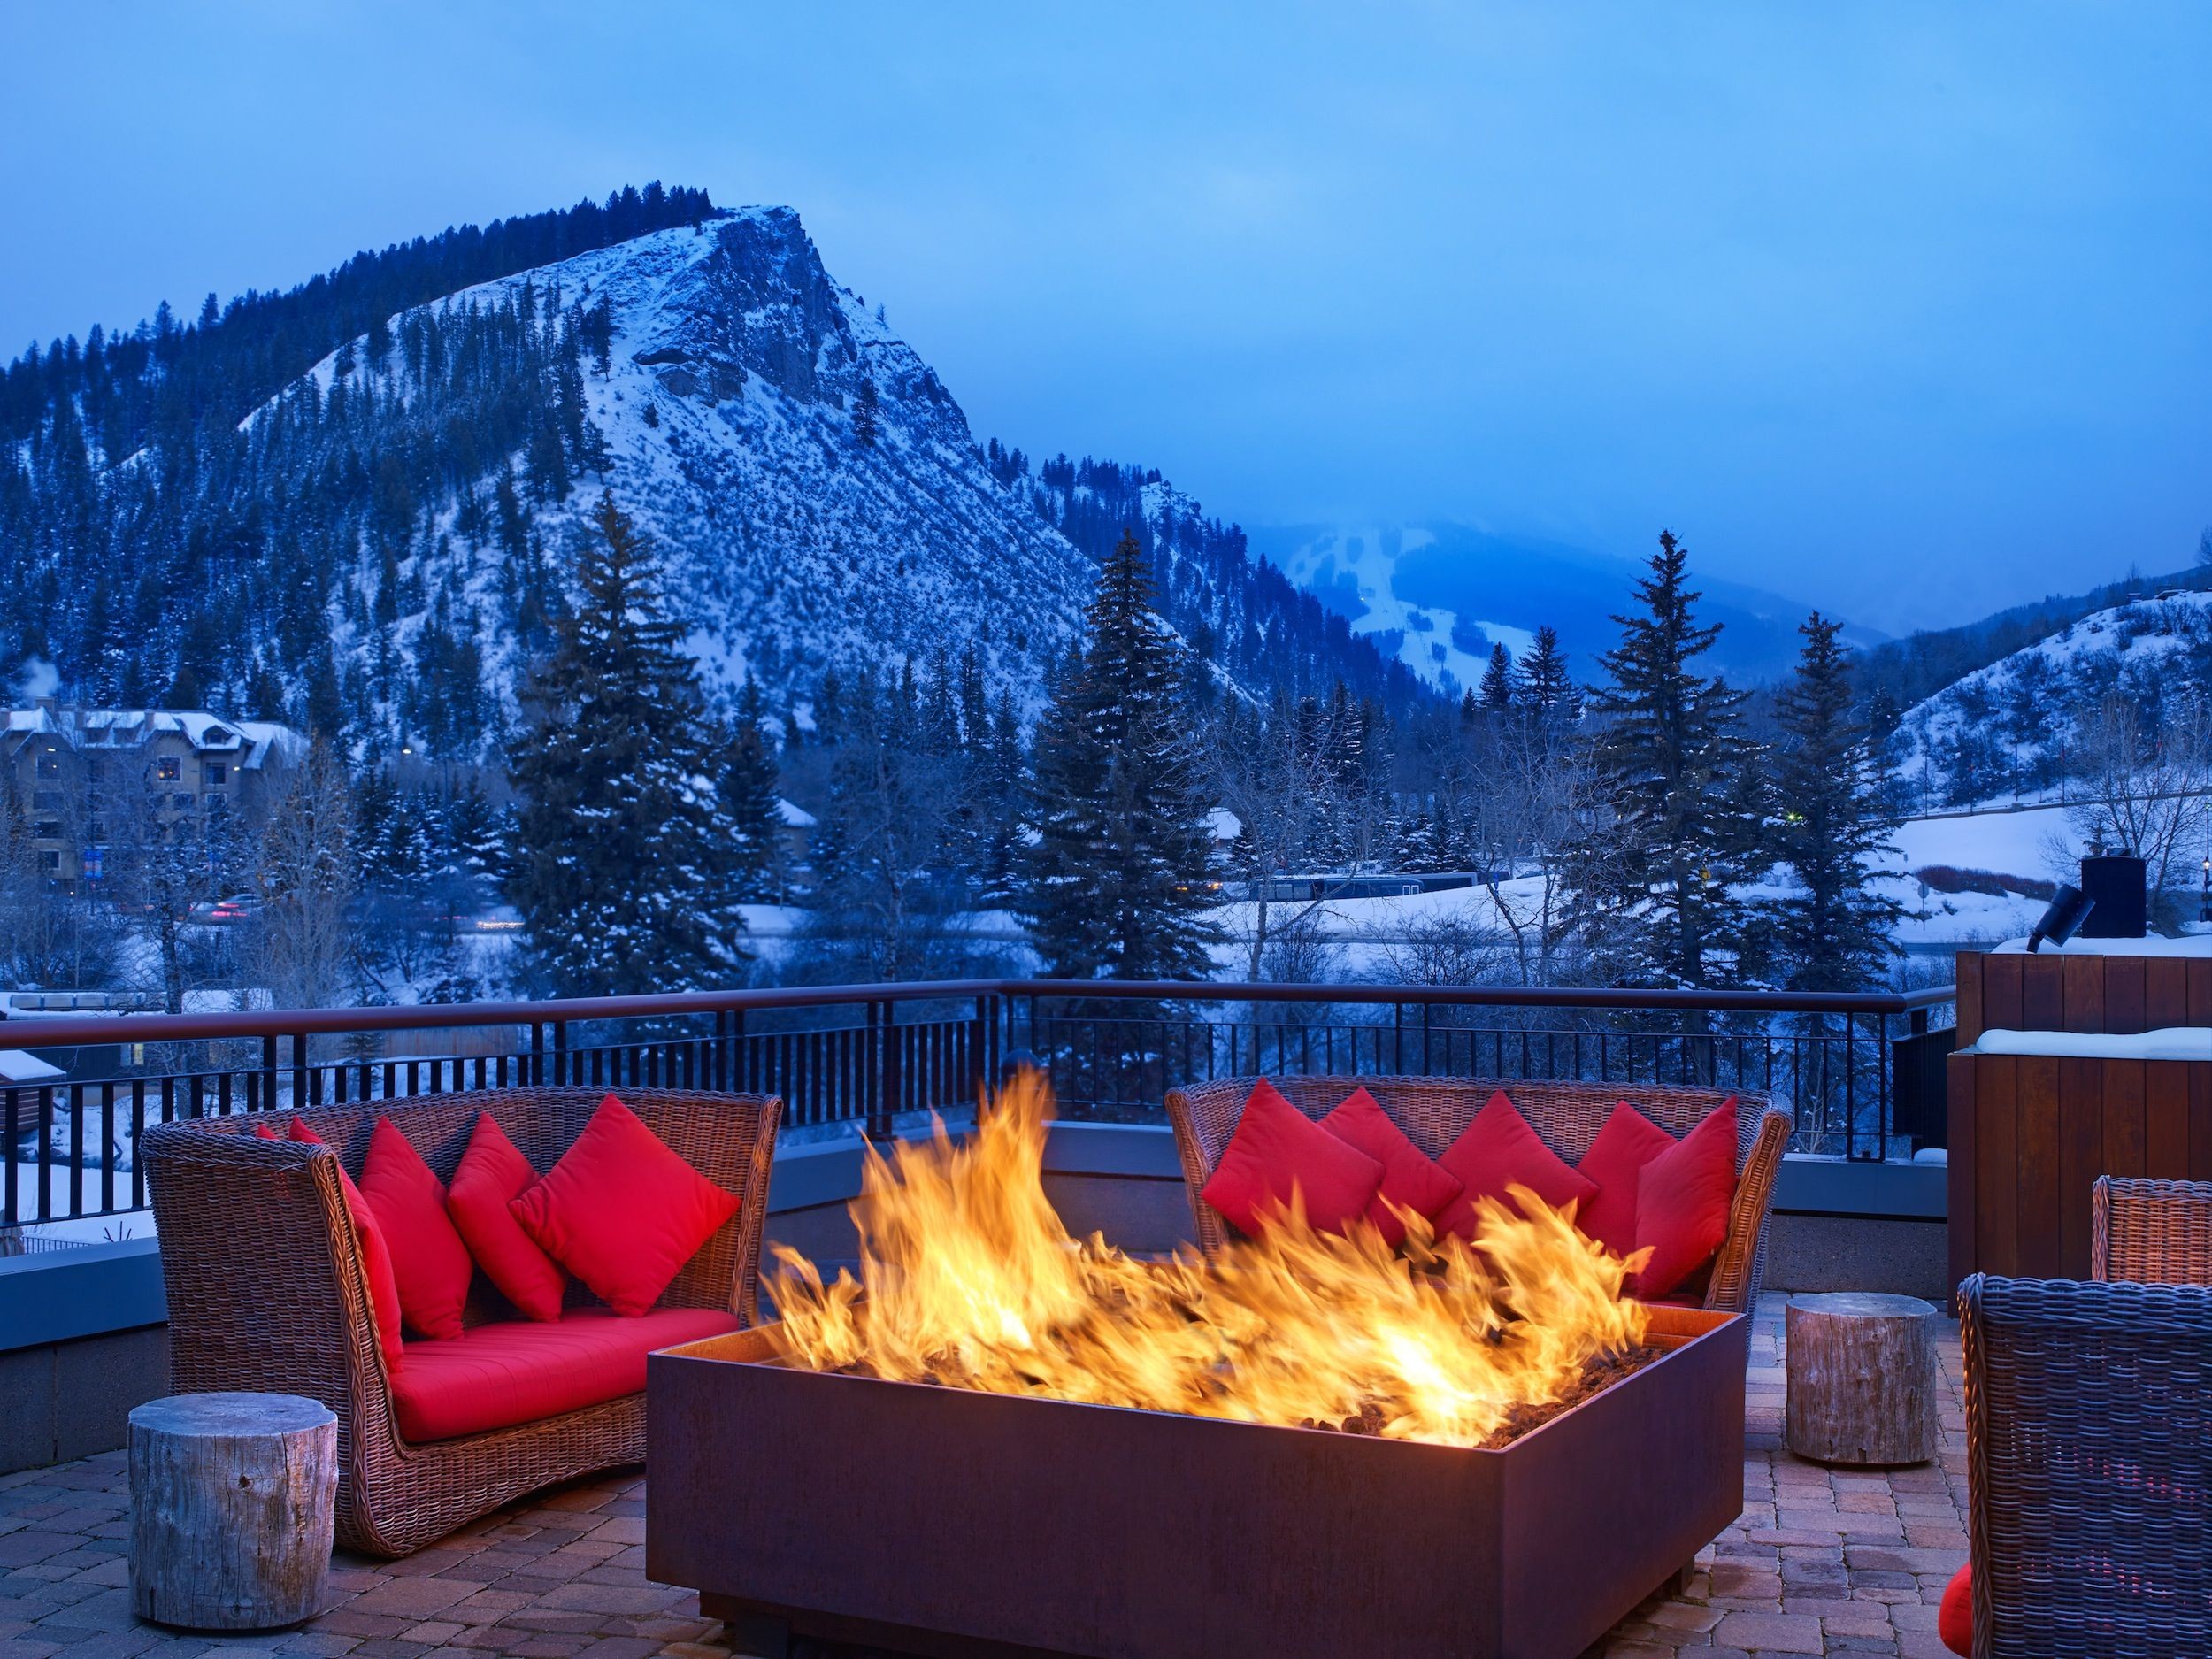 Elegant Mayau0027s Patio Fire Pit Is The Perfect Spot To Enjoy Apres Ski.